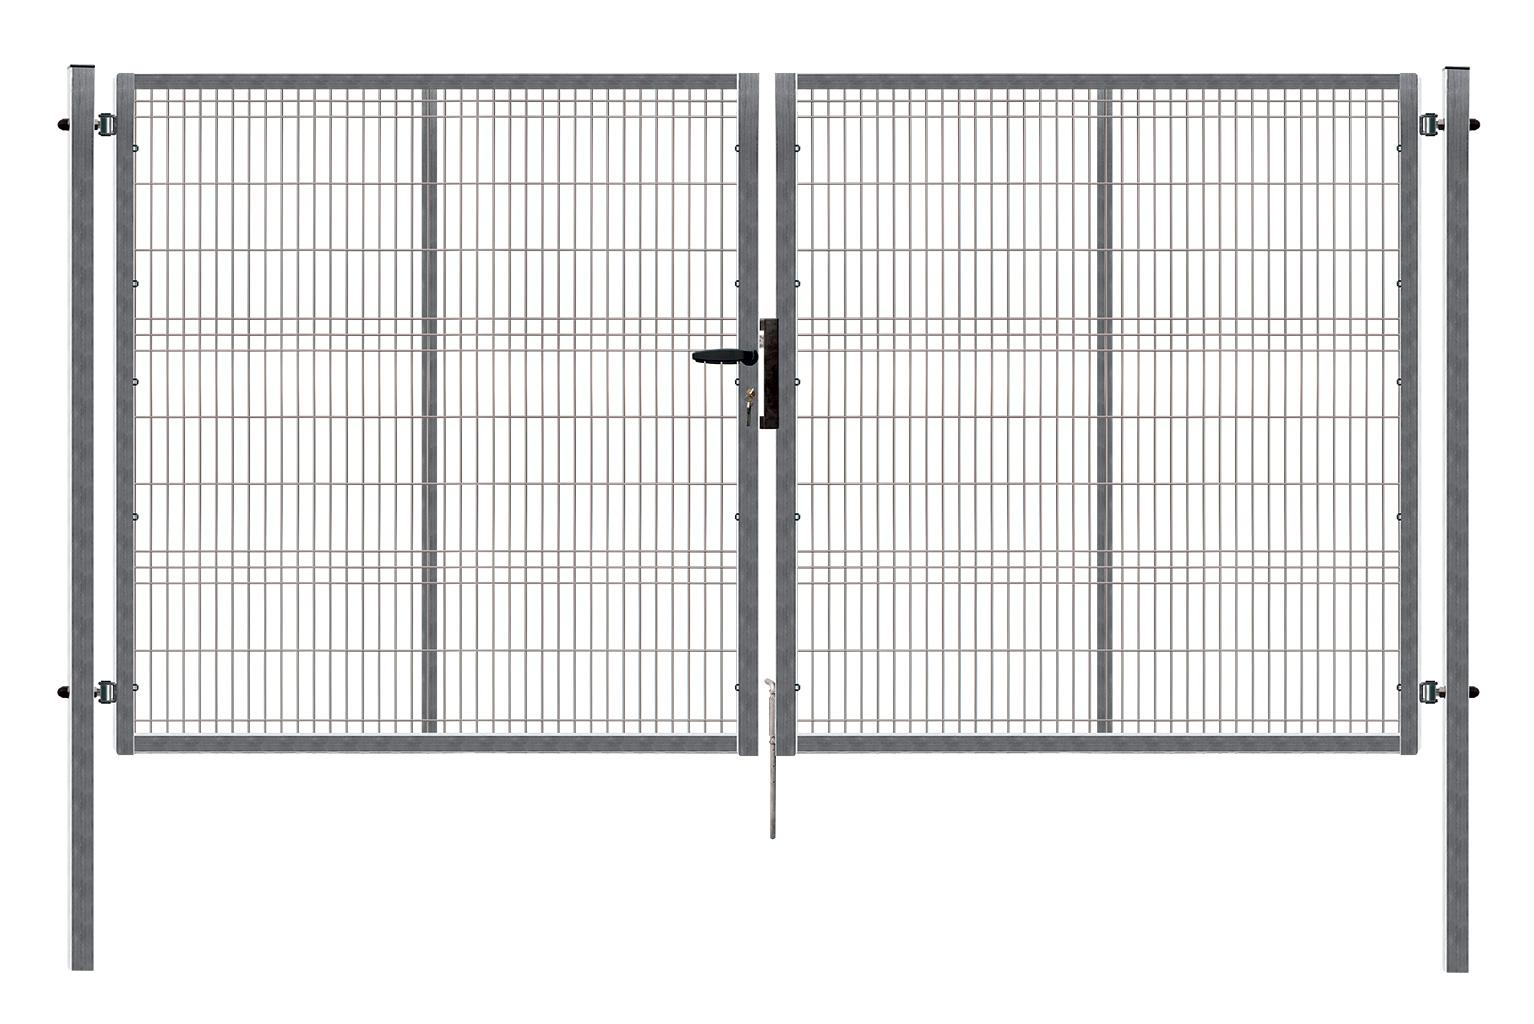 Brána PILOFOR dvoukřídlá, 4118x2045 mm, Zn 97,5Kg